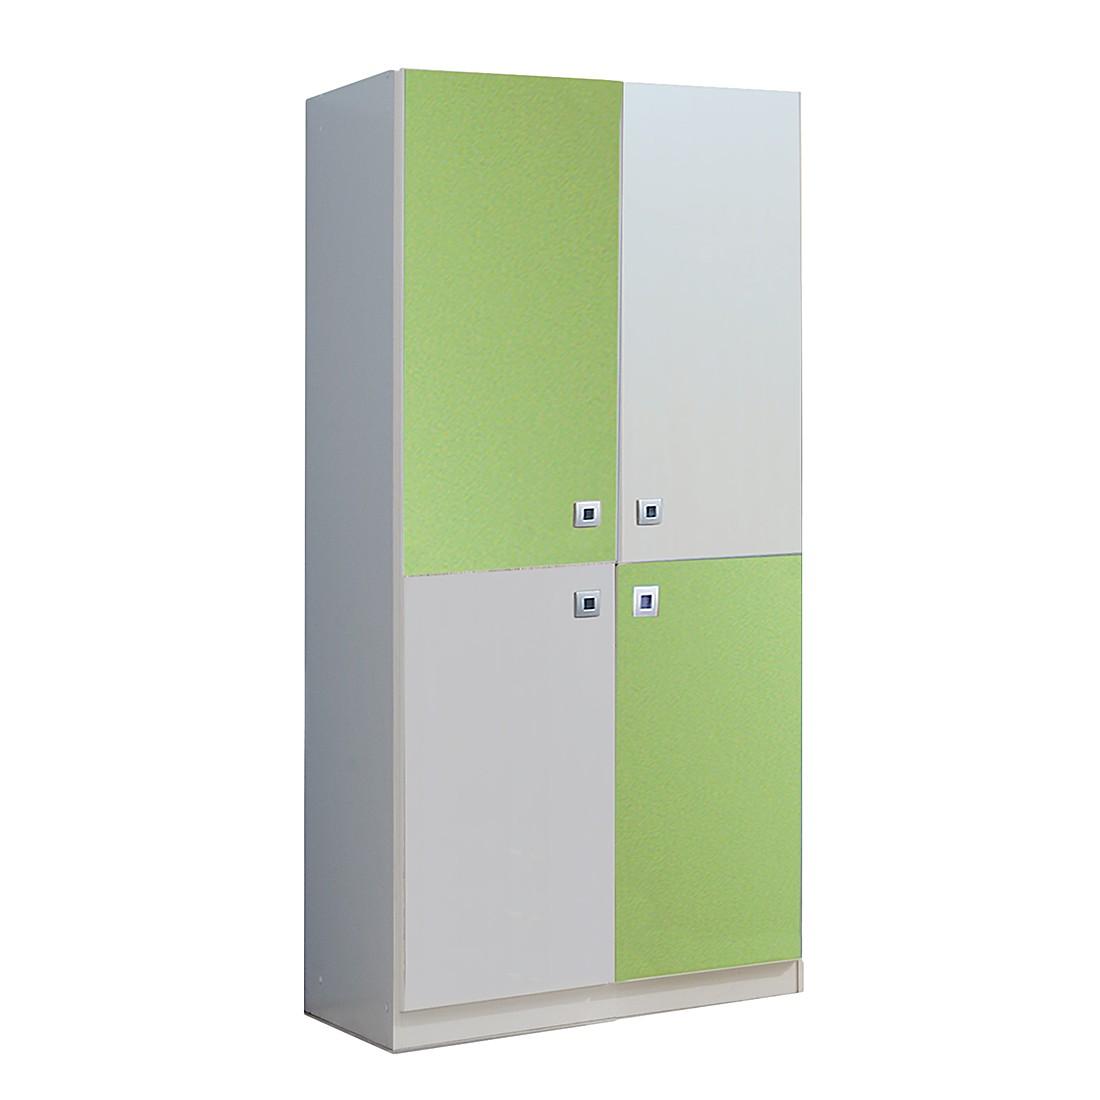 Armoire à vêtements Sunny I - Blanc alpin / Vert pomme, Wimex